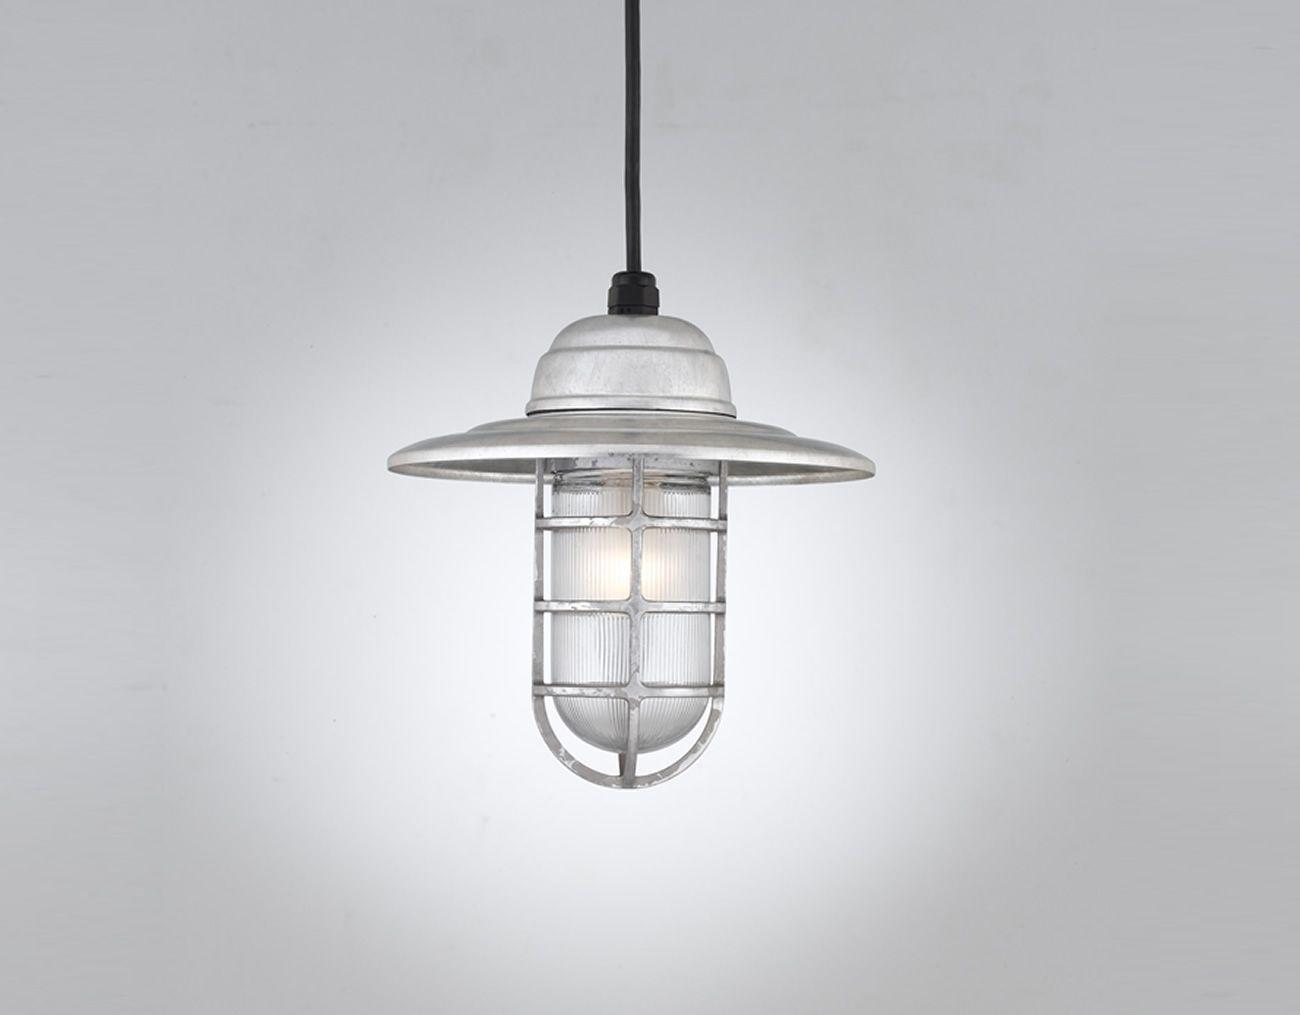 Hi Lite Mfg Co Inc Image Library Vapor Jar Flush Mount Wall Ceiling Lights Rustic Pendant Lighting Barn Lighting